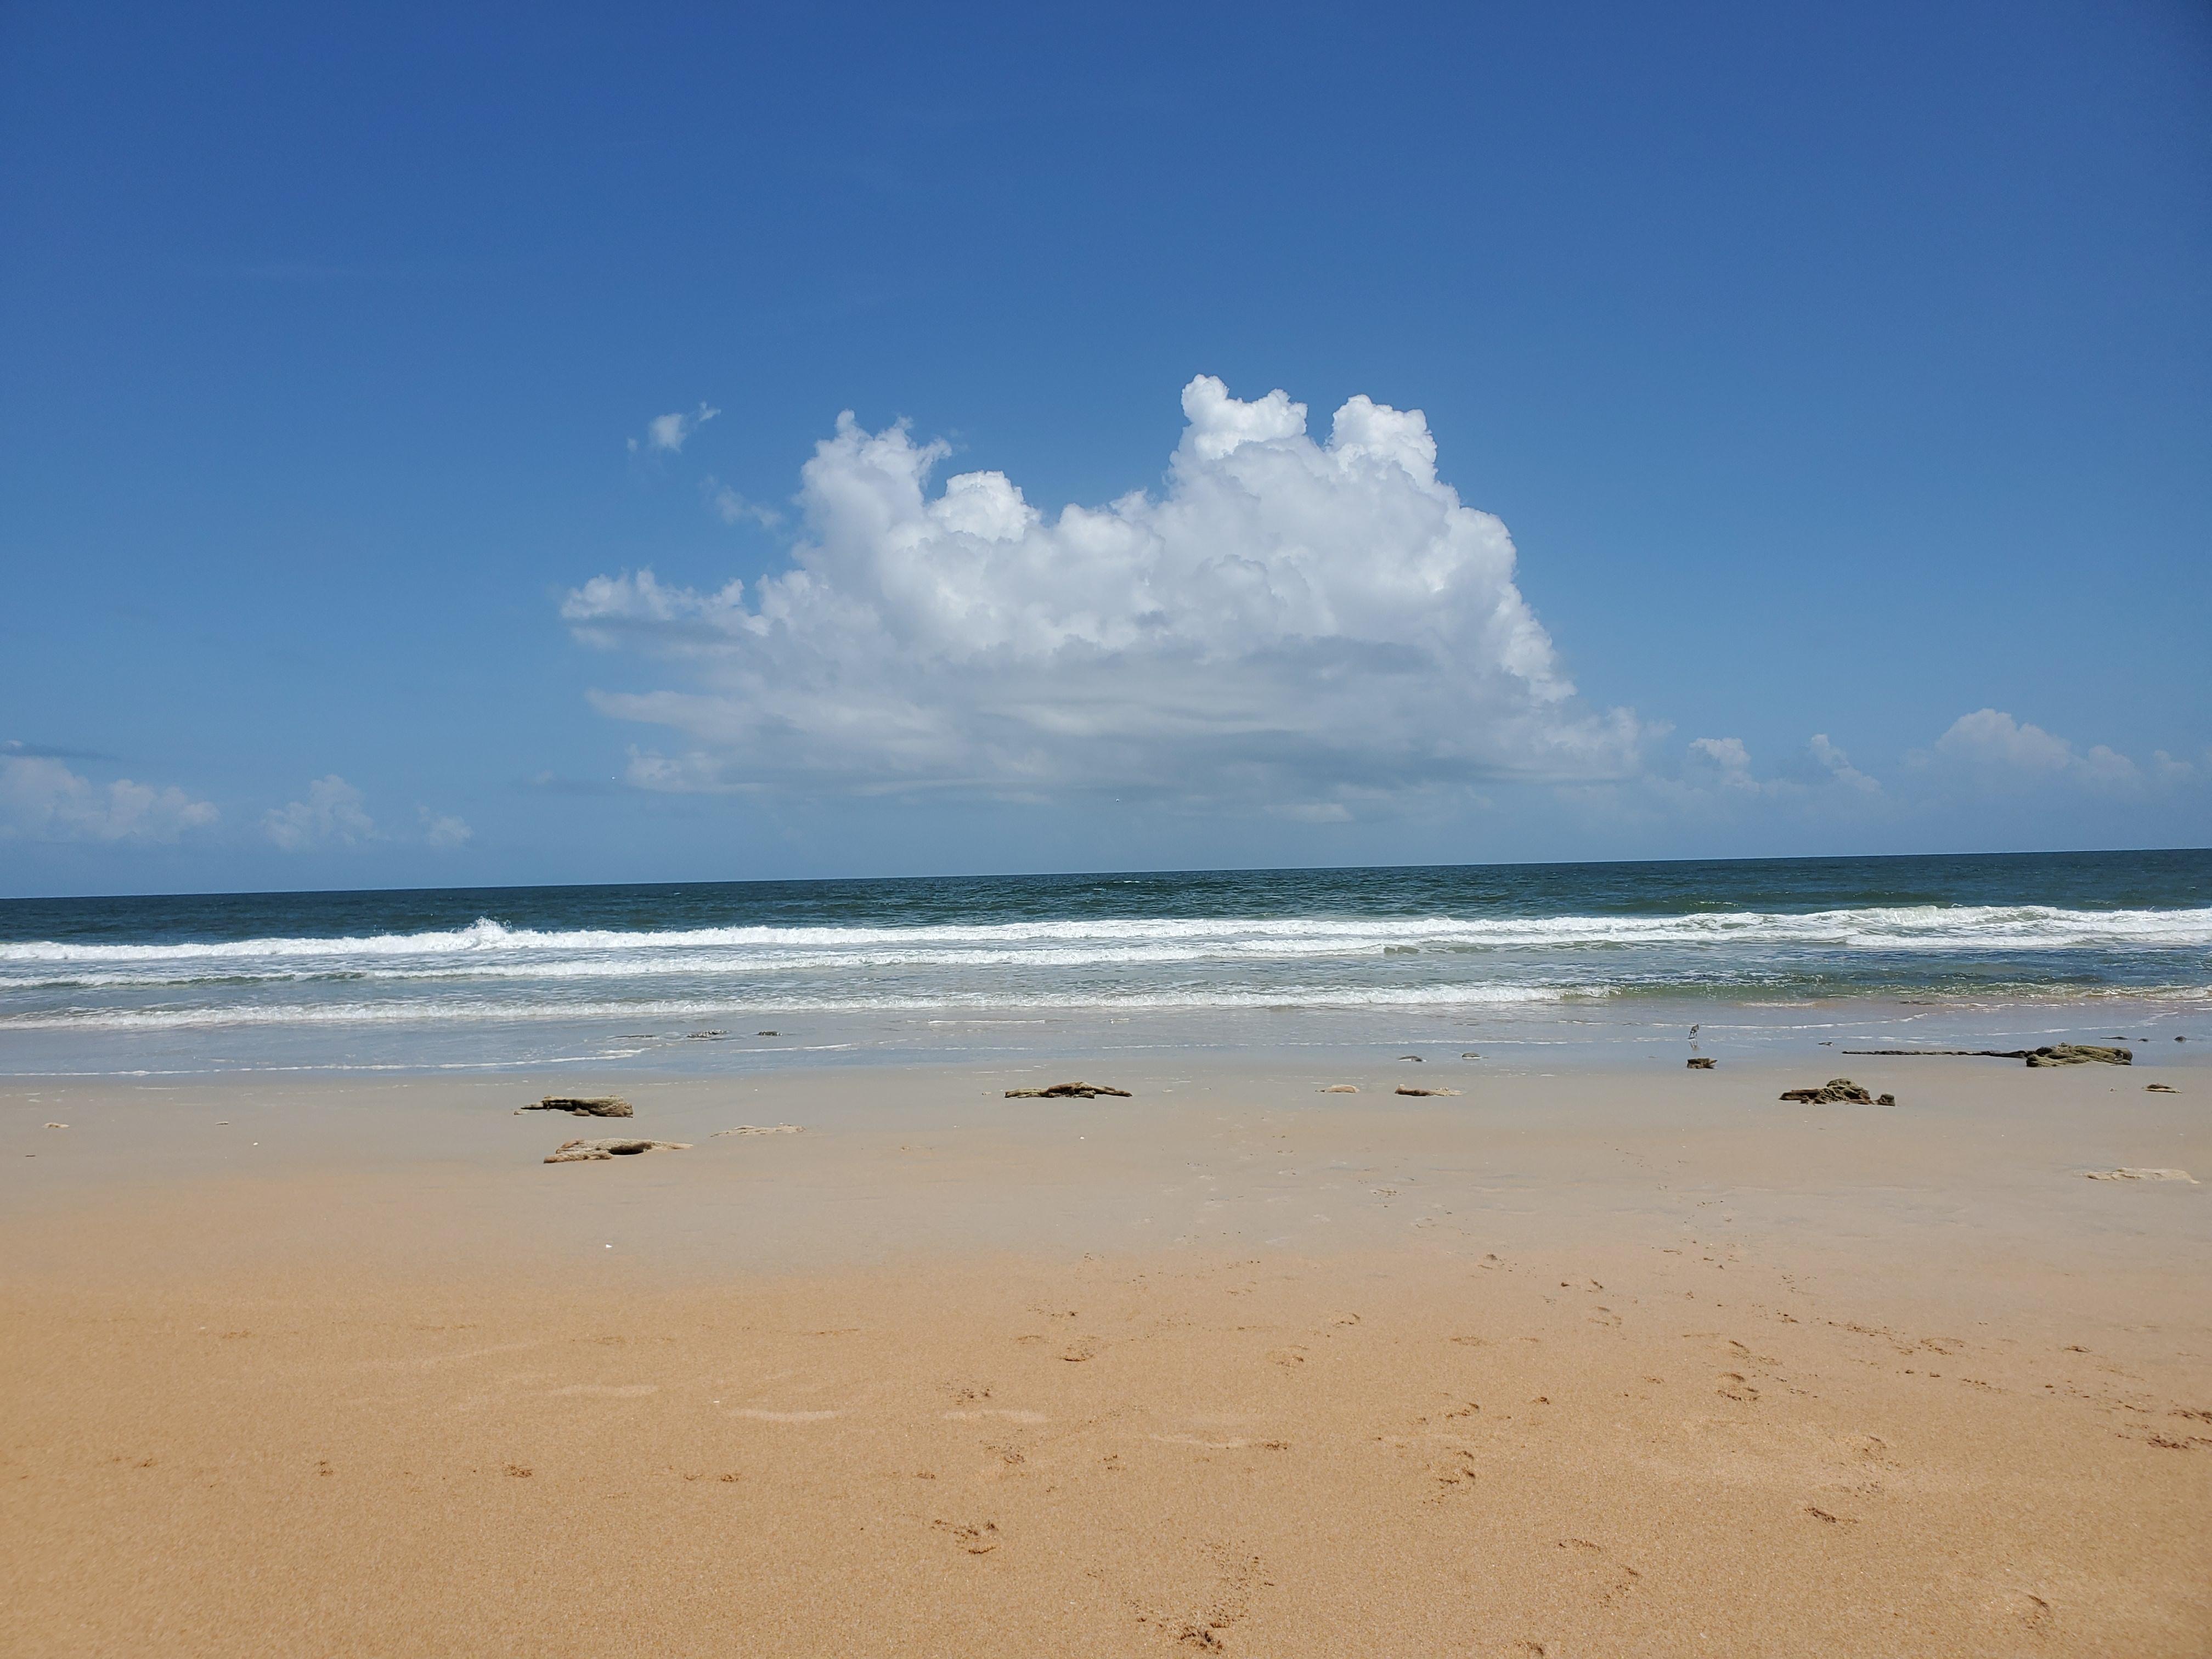 The beach at Malacompra